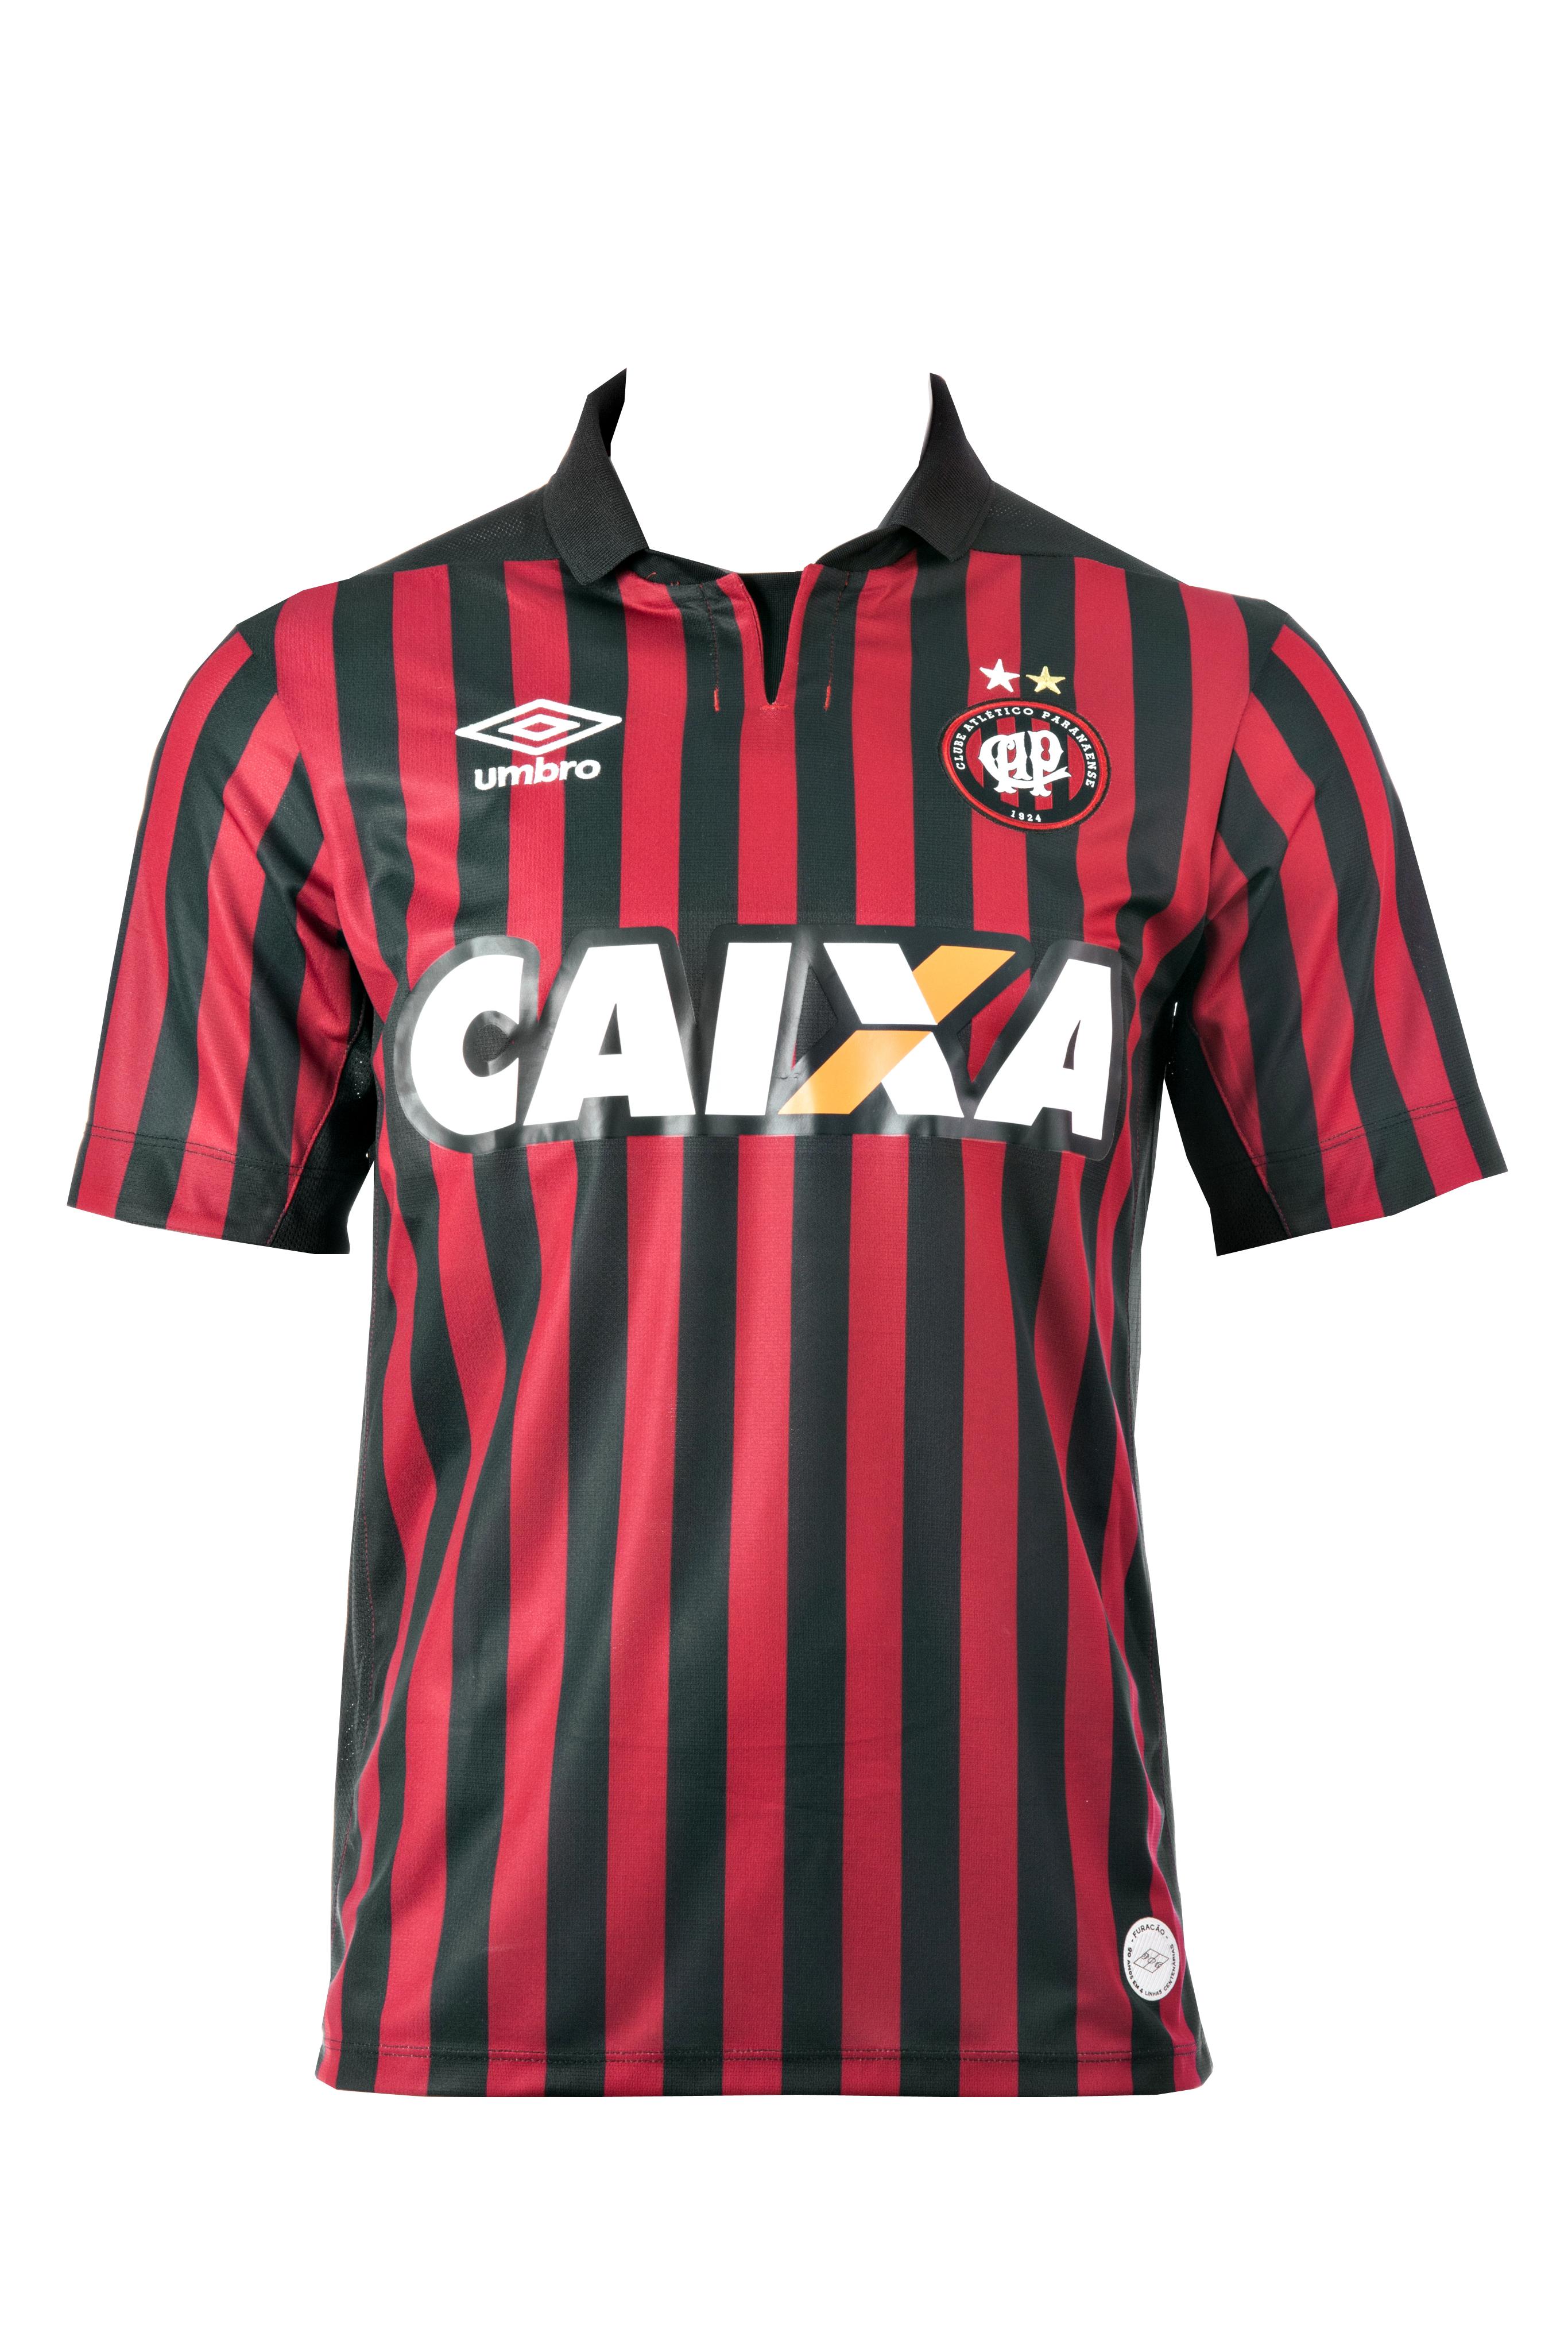 Barclays Premier League – Fut Pop Clube ab15a8b0b9a5c